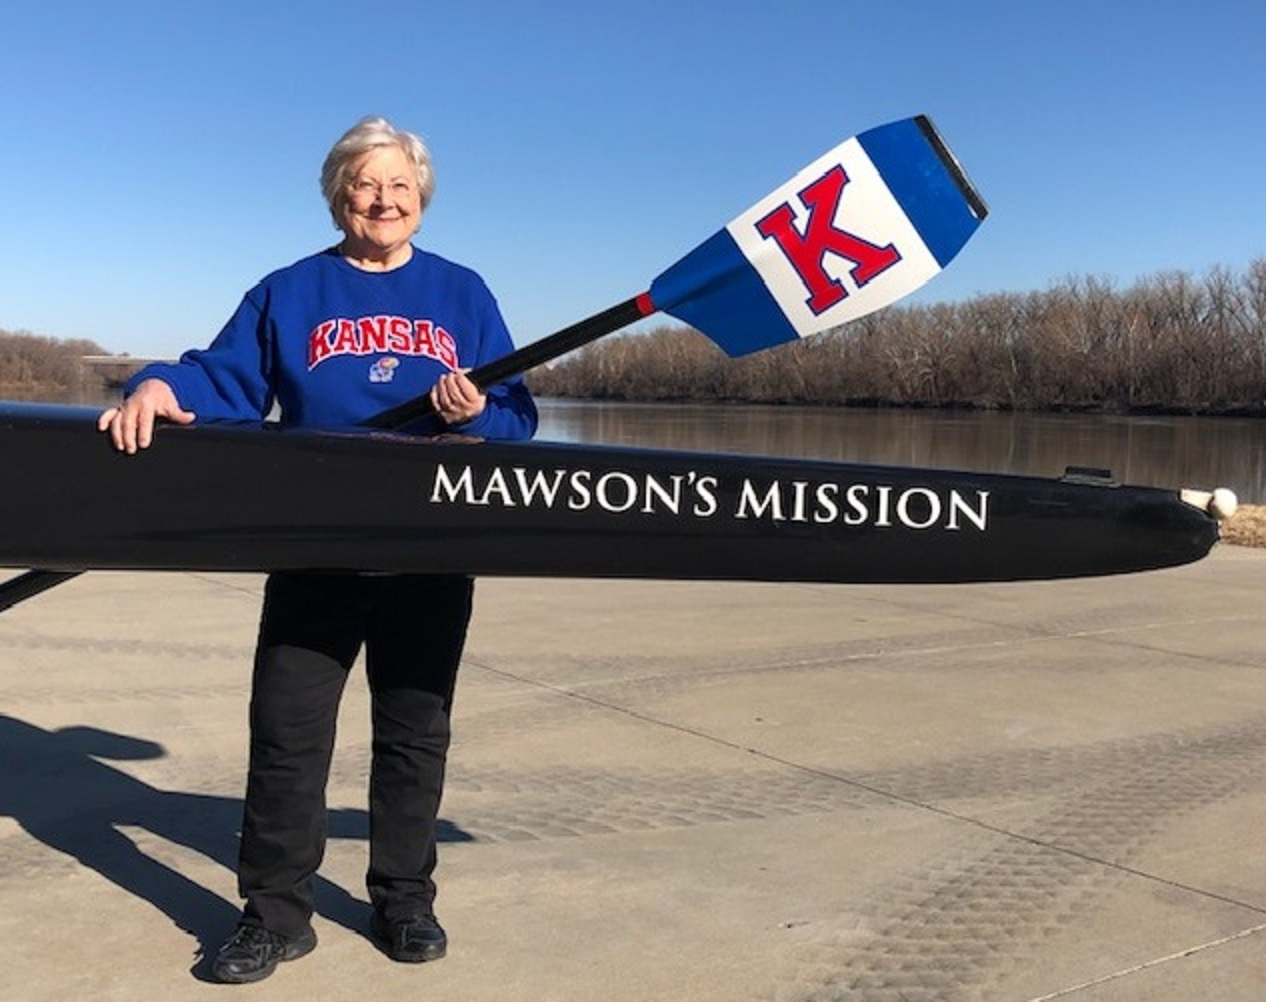 How we worked to establish women's intercollegiate athletics in Kansas before Title IX